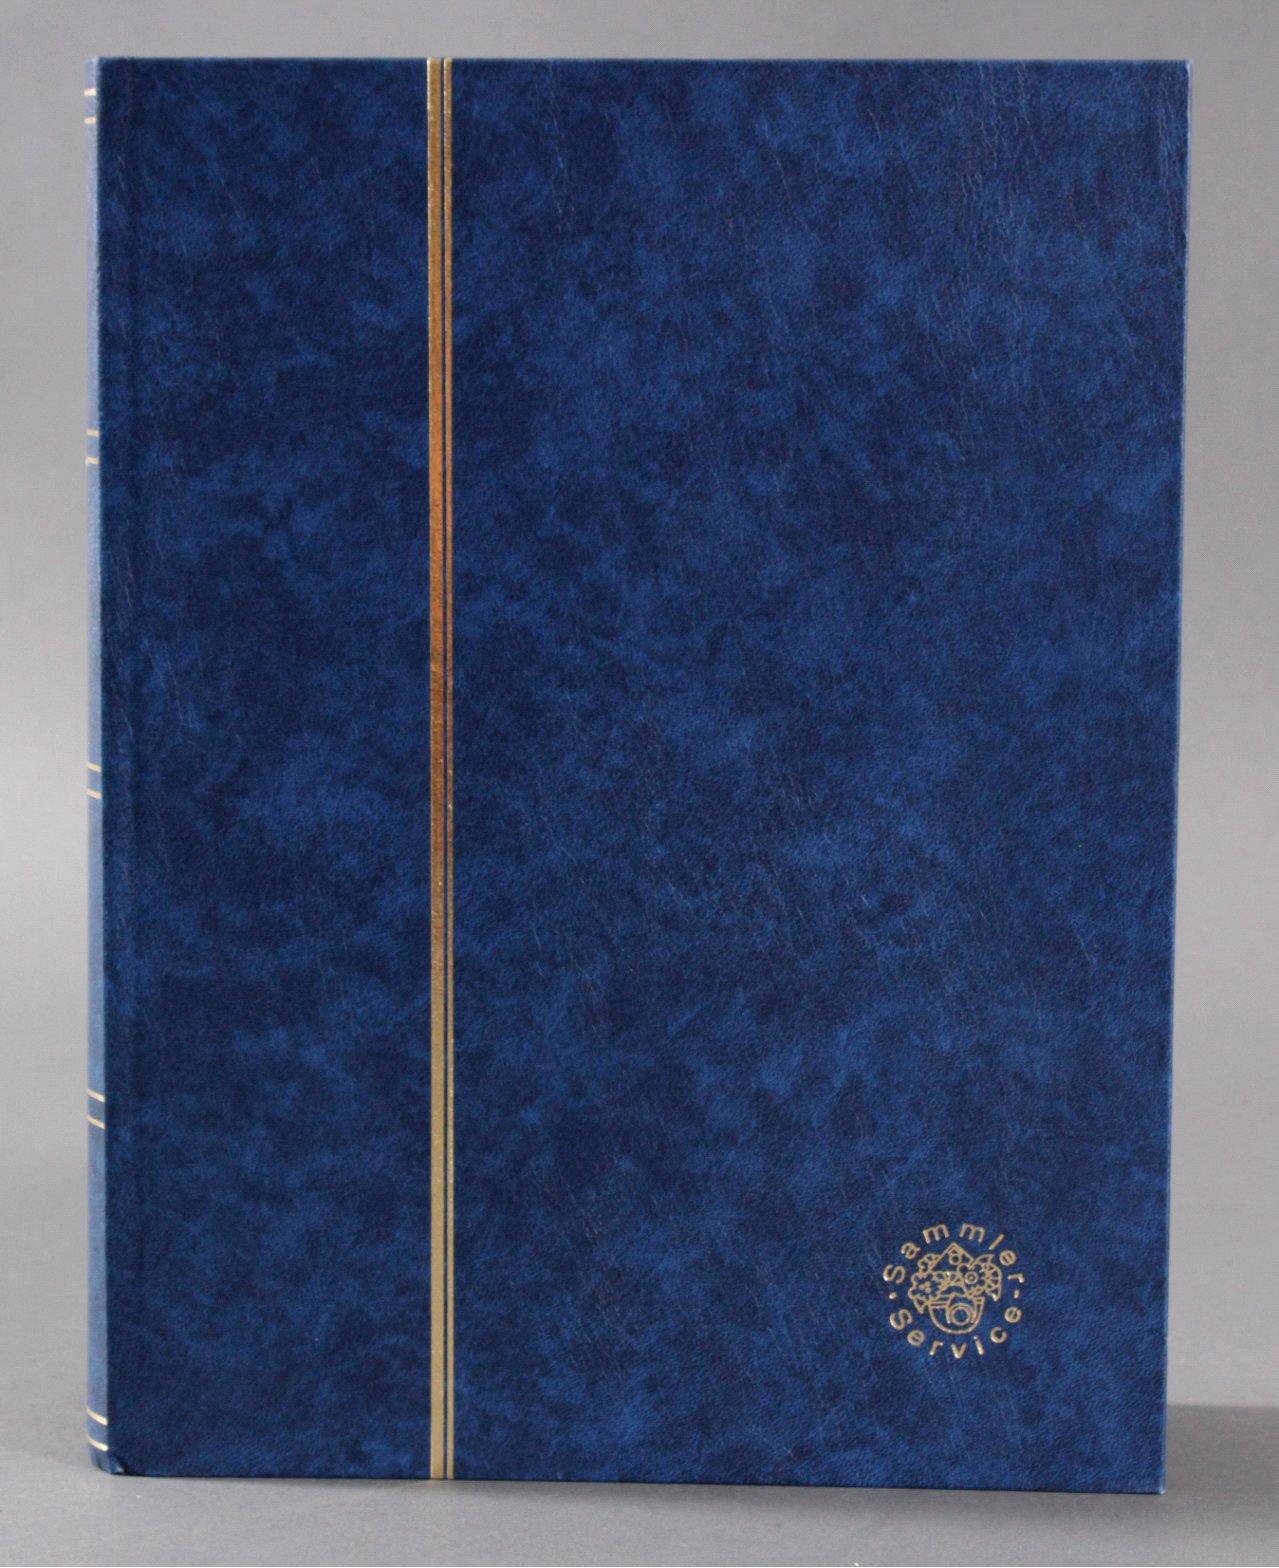 MONACO 1953-1989, Katalogwert 970,- Euro-5